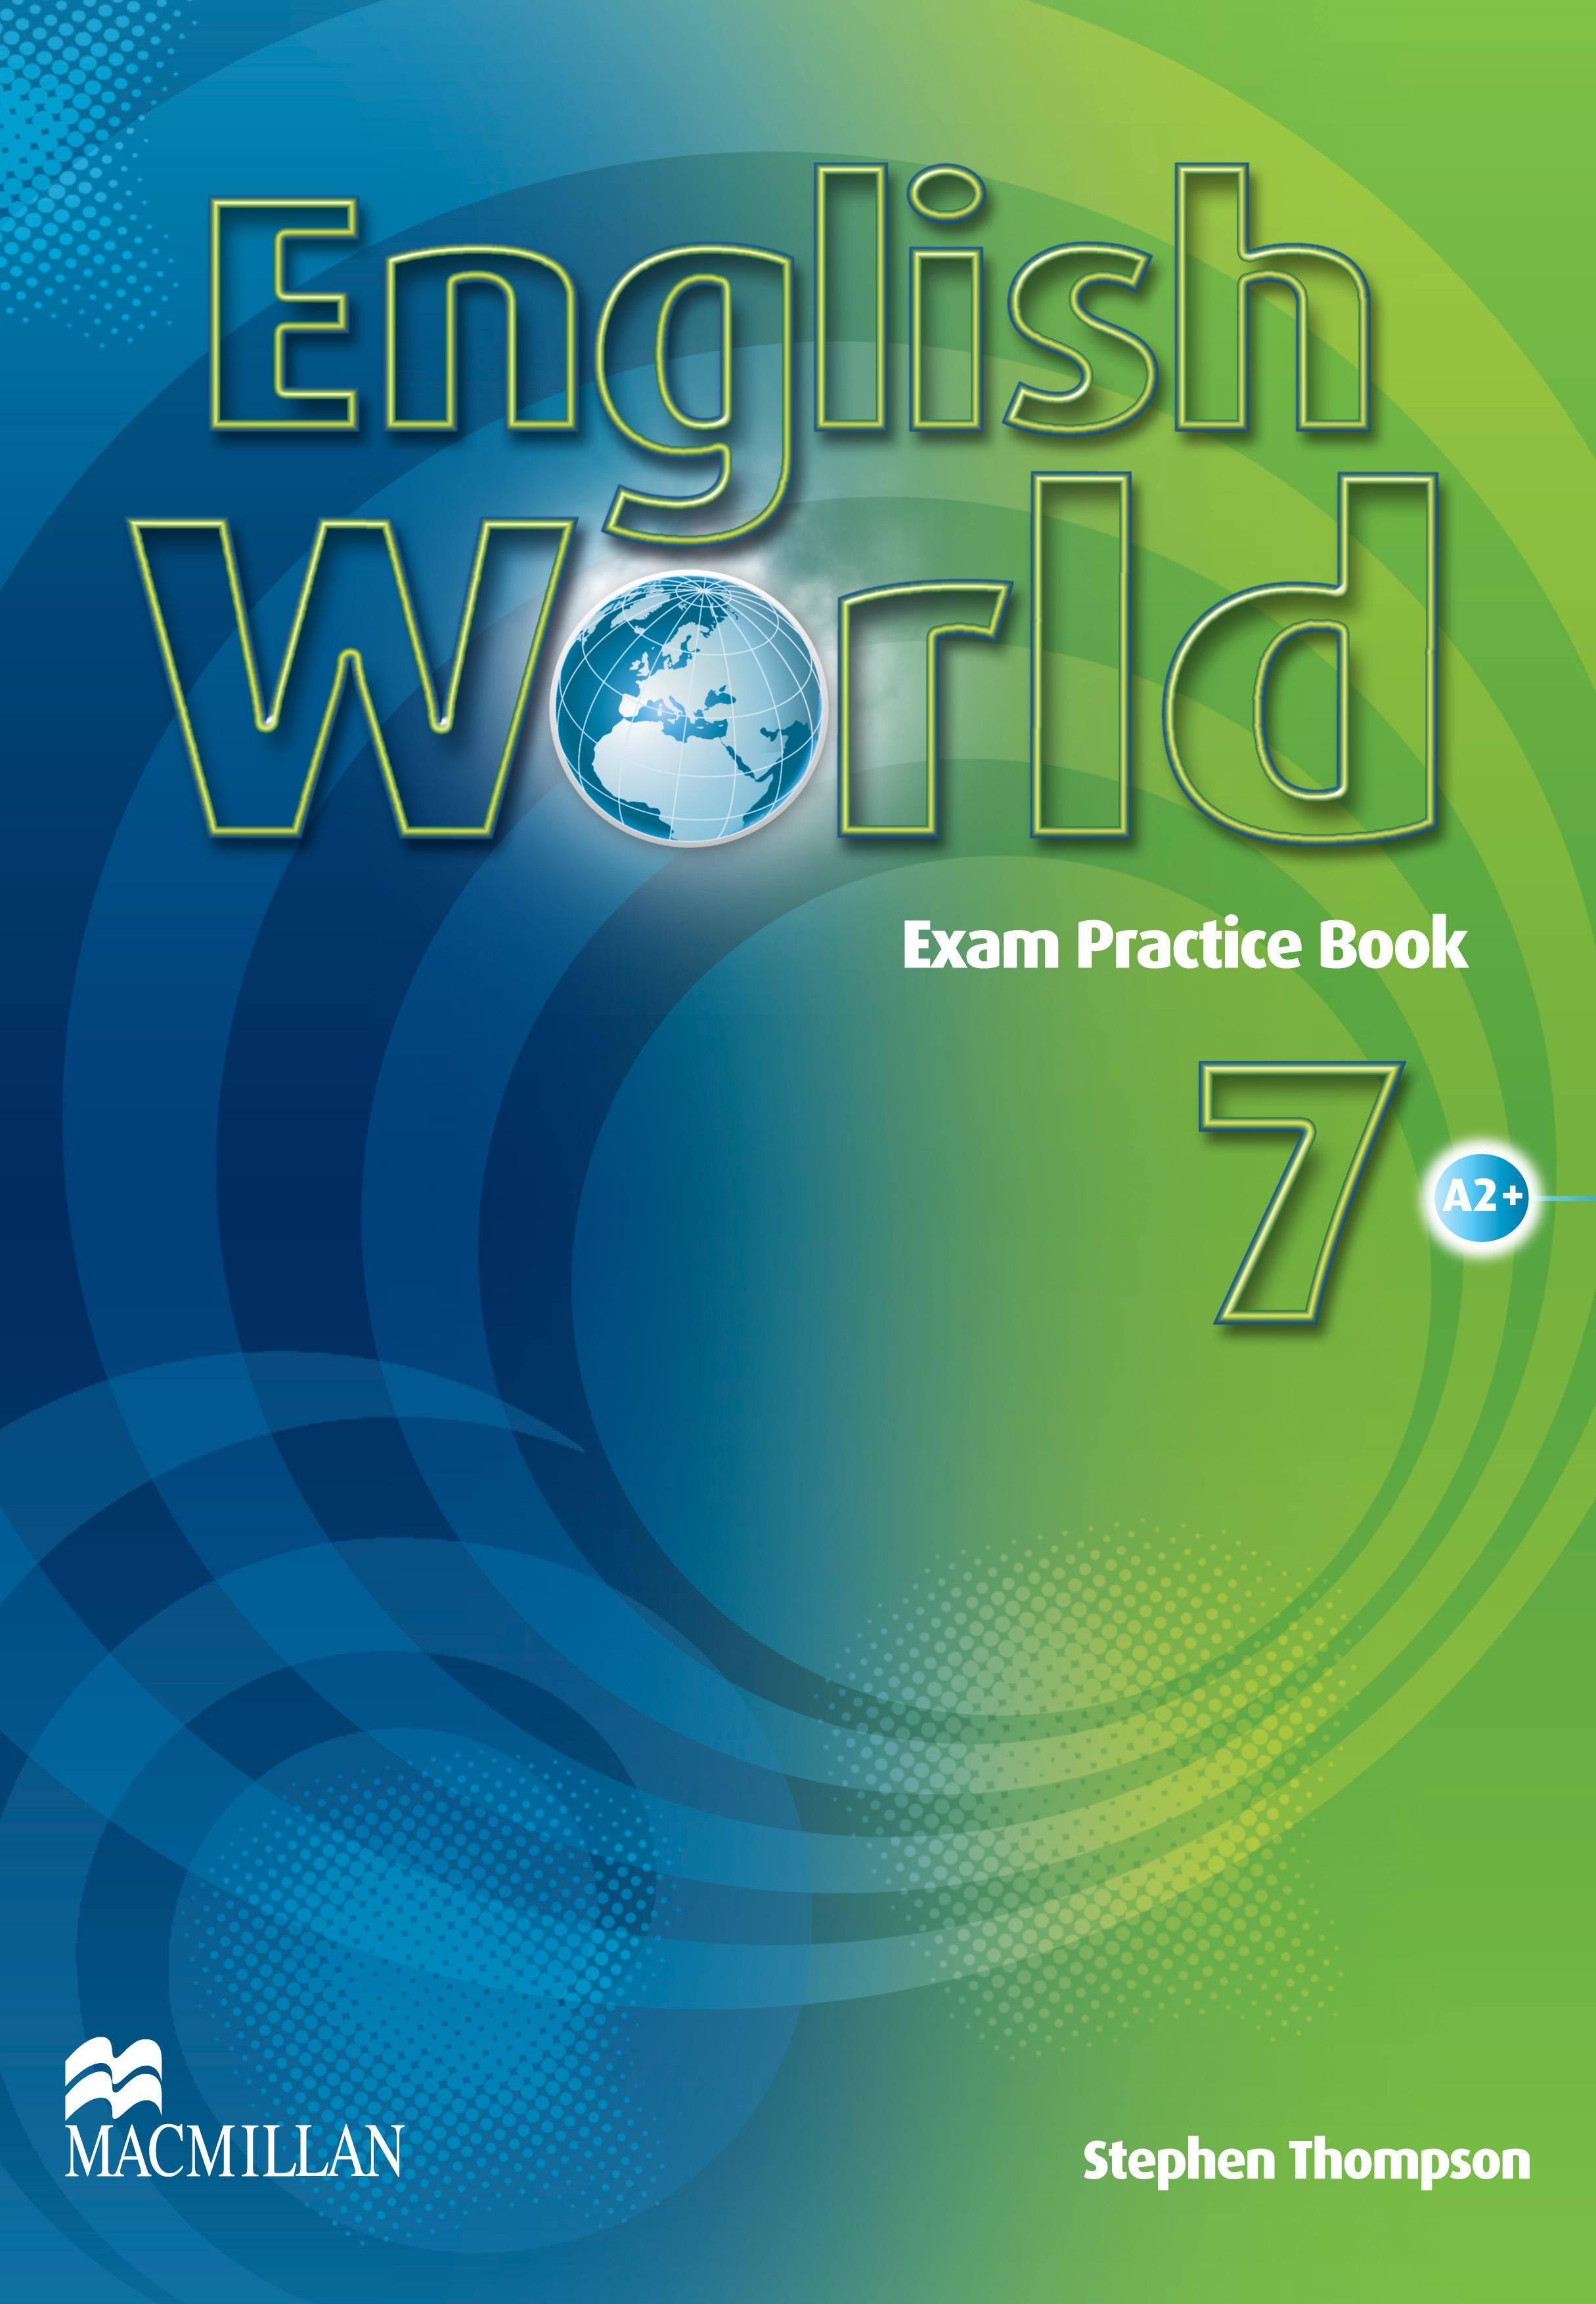 English World 7 Exam Practice Book